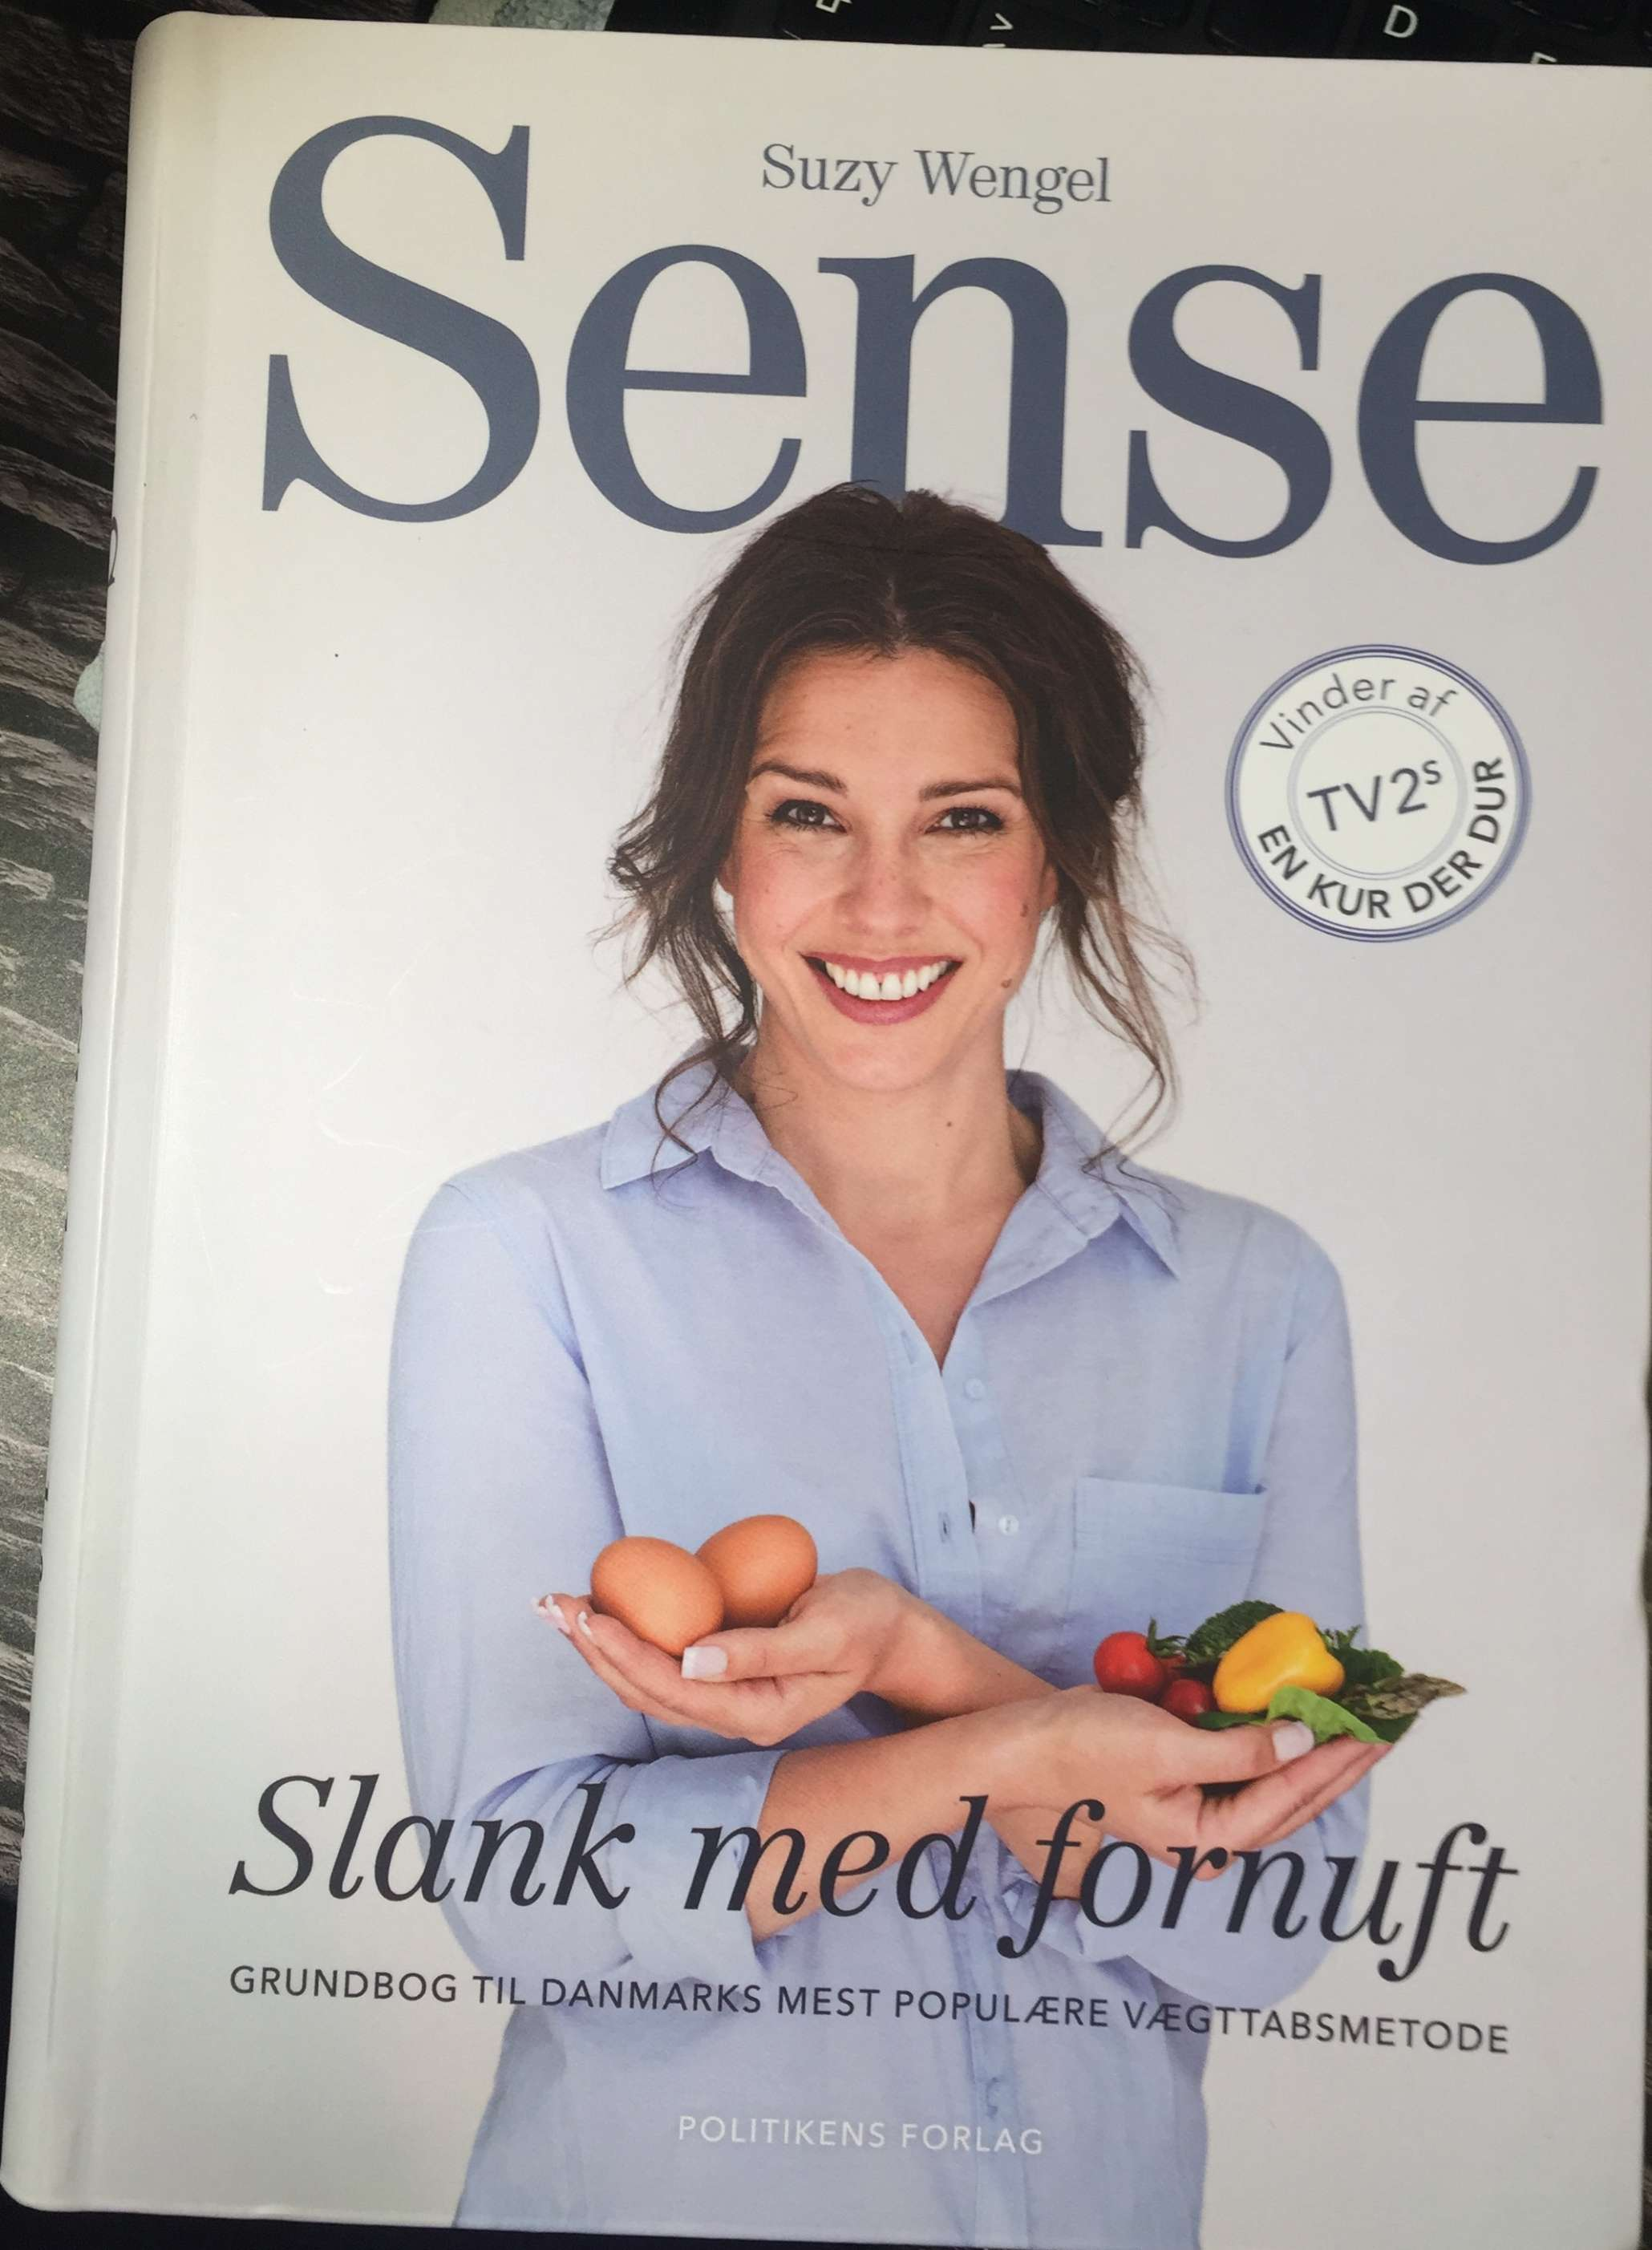 Suzy Wengel, Sense, Slank med fornuft, Grundbog, Politikens Forlag, Sense med Suzy Wengel, Bogforum, Bogforum 2017